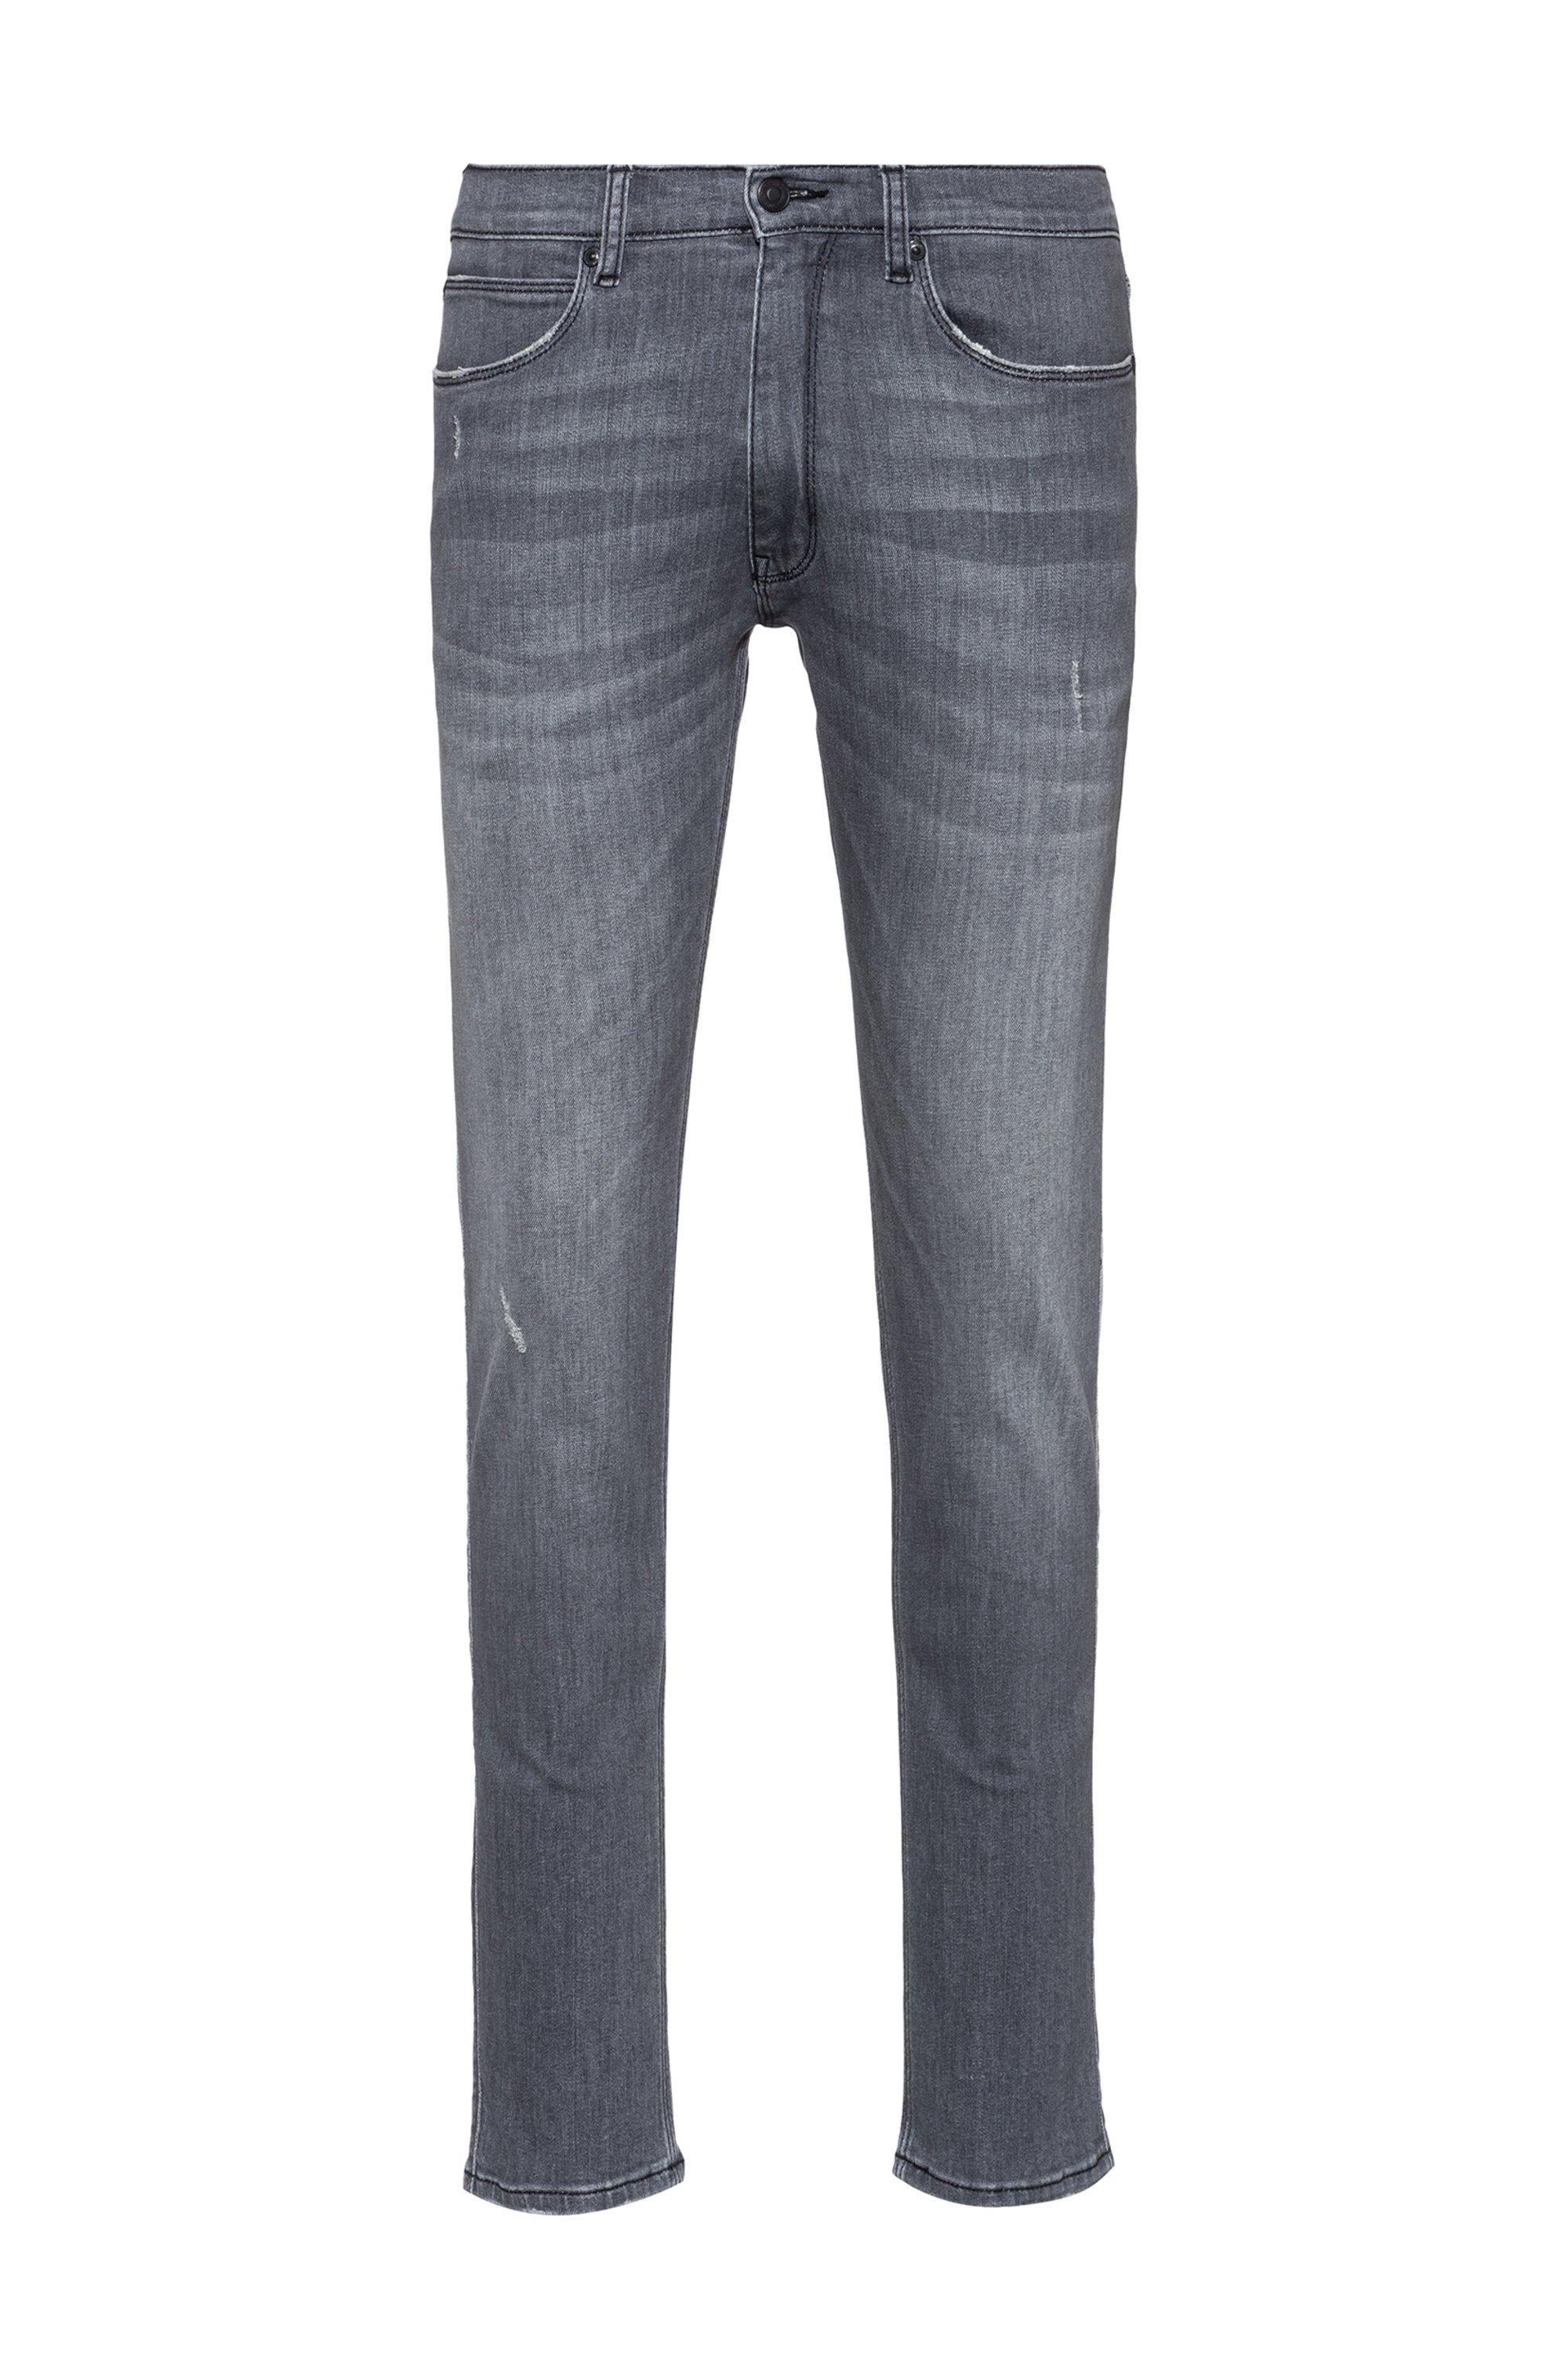 Extra-slim-fit jeans in grey comfort-stretch denim, Grey